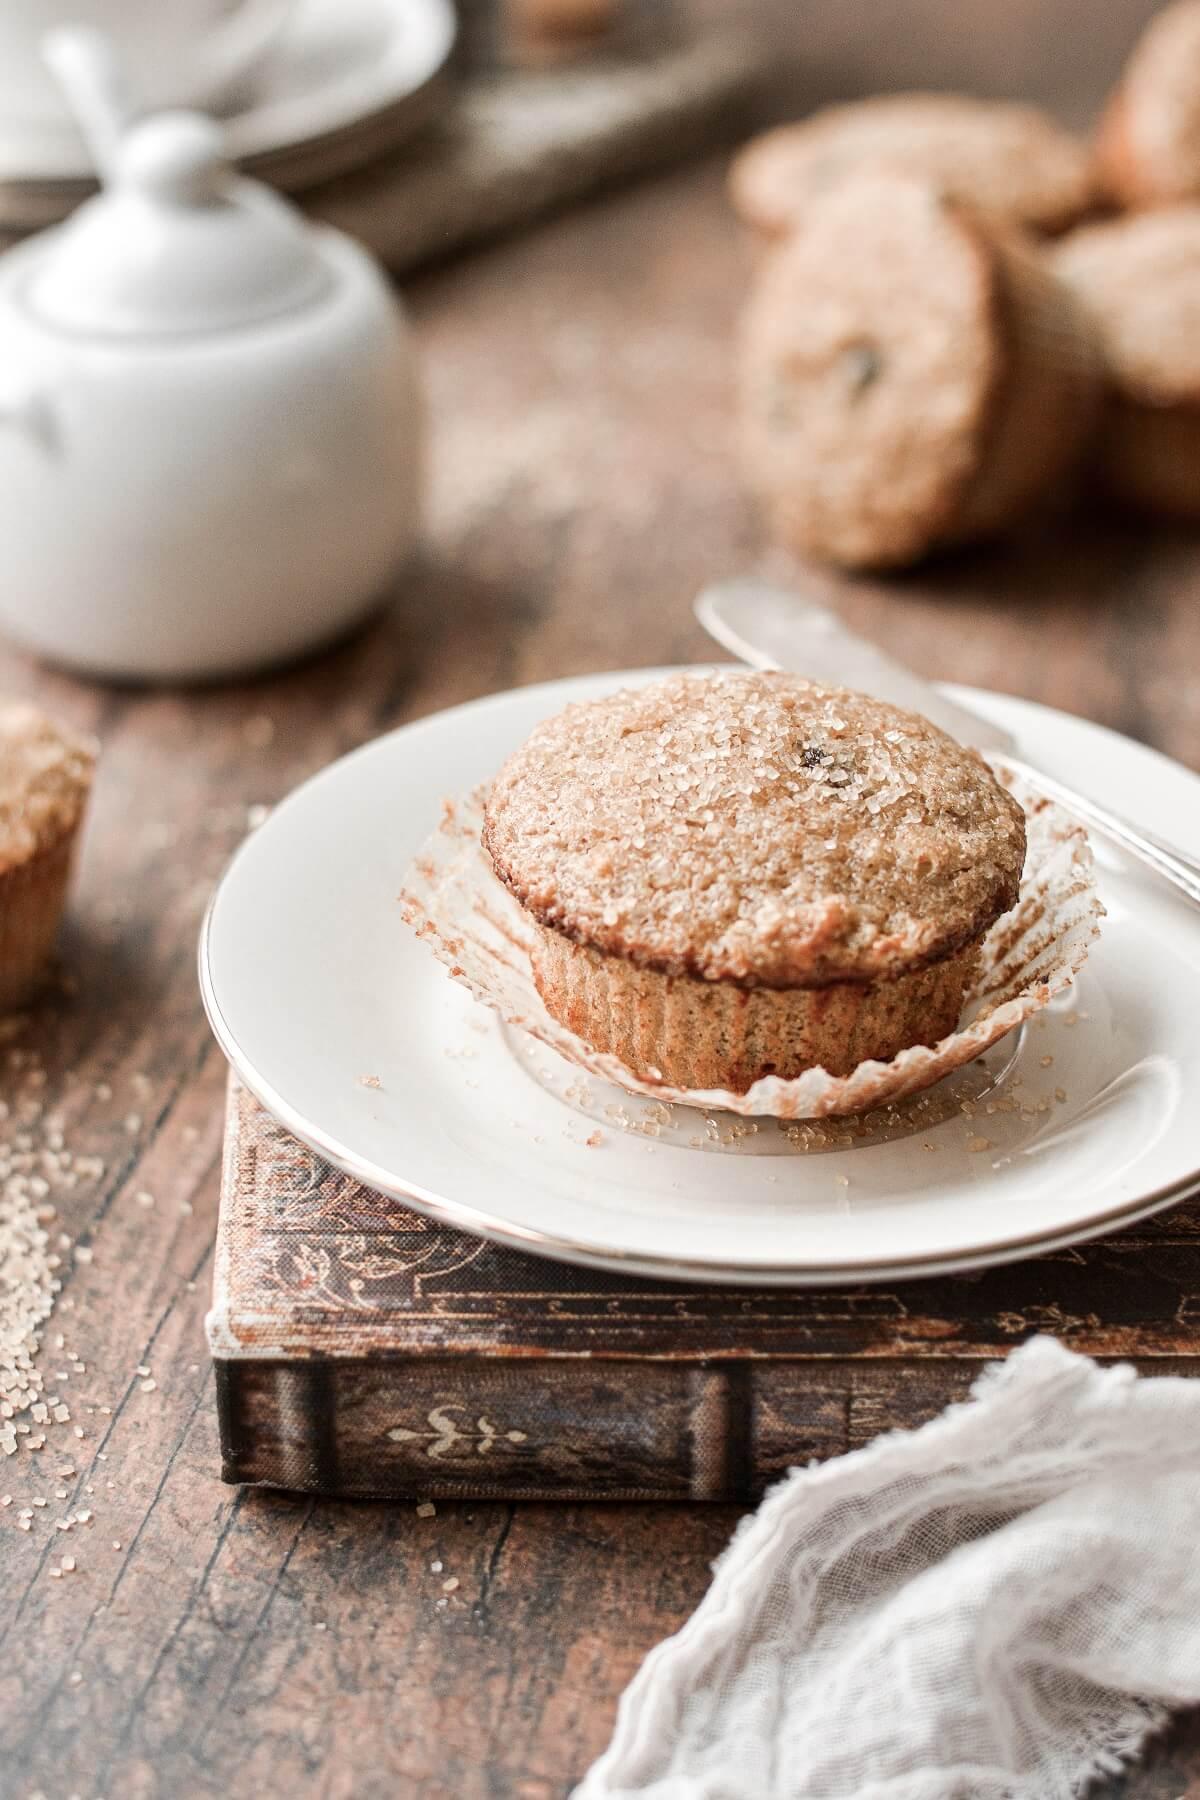 An oatmeal raisin muffin, sprinkled with coarse sugar.